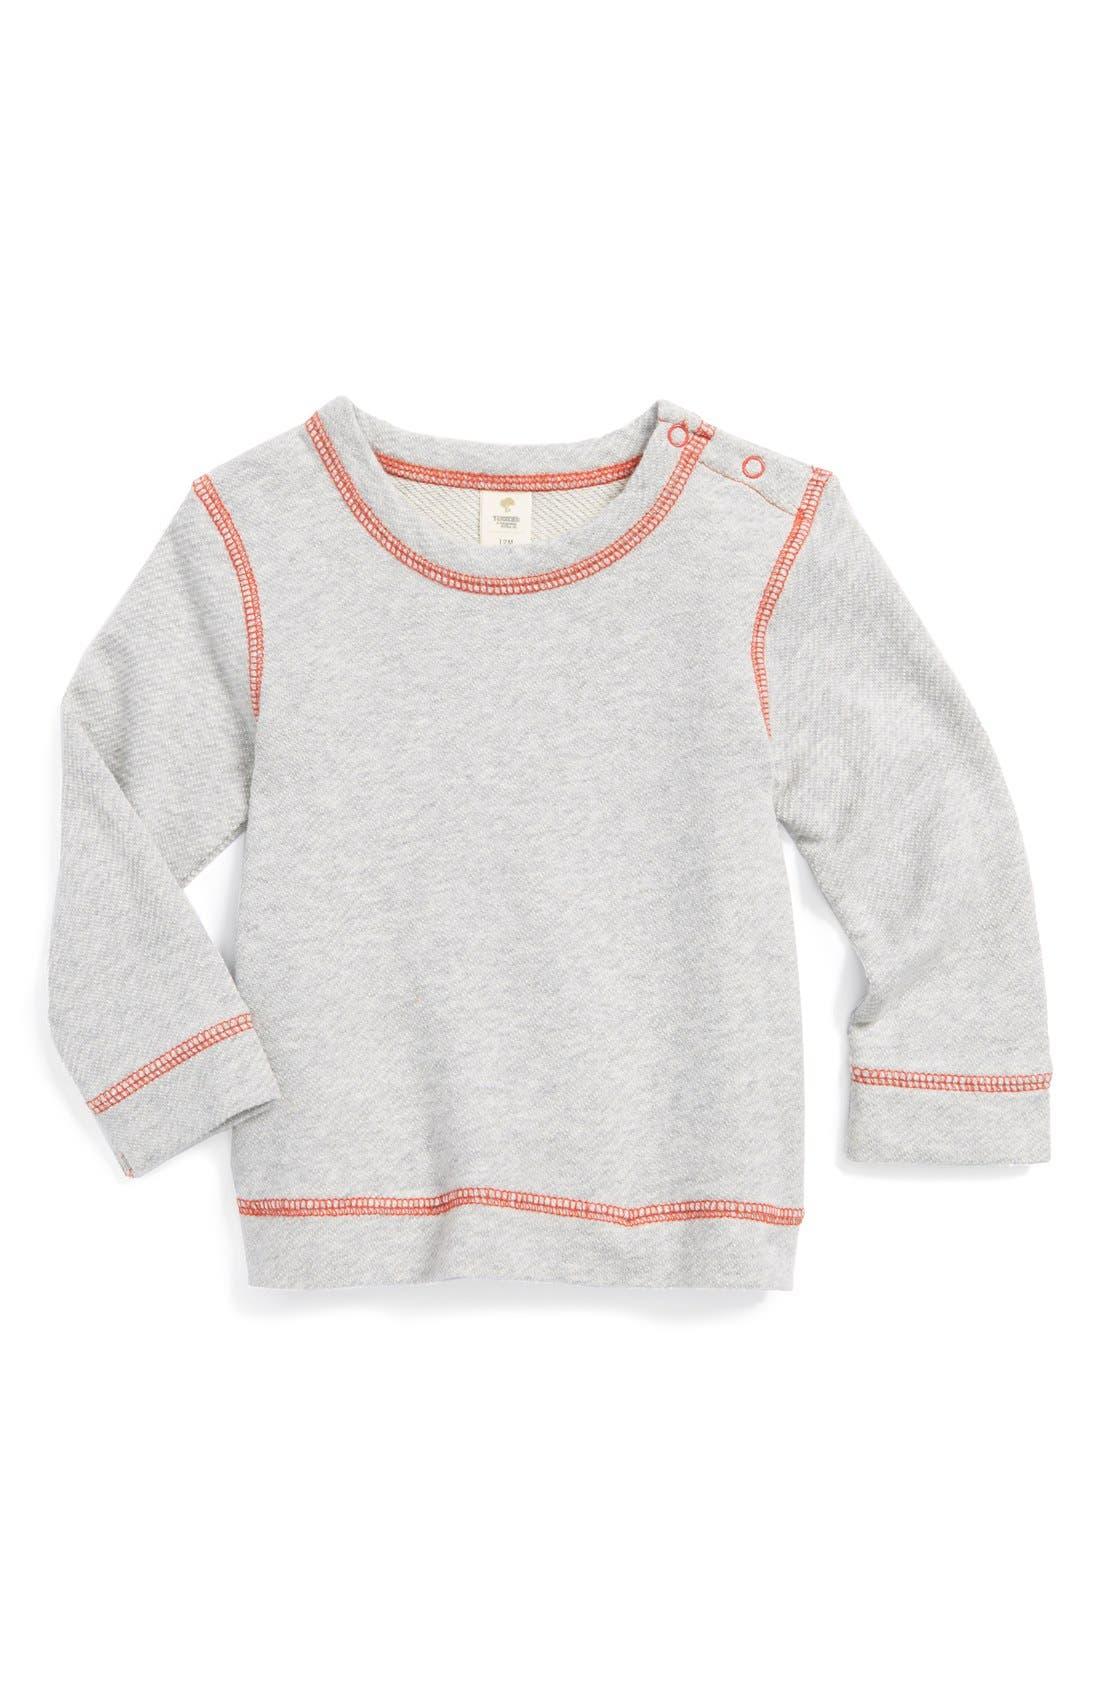 Alternate Image 1 Selected - Tucker + Tate Cotton Sweatshirt (Baby Boys)